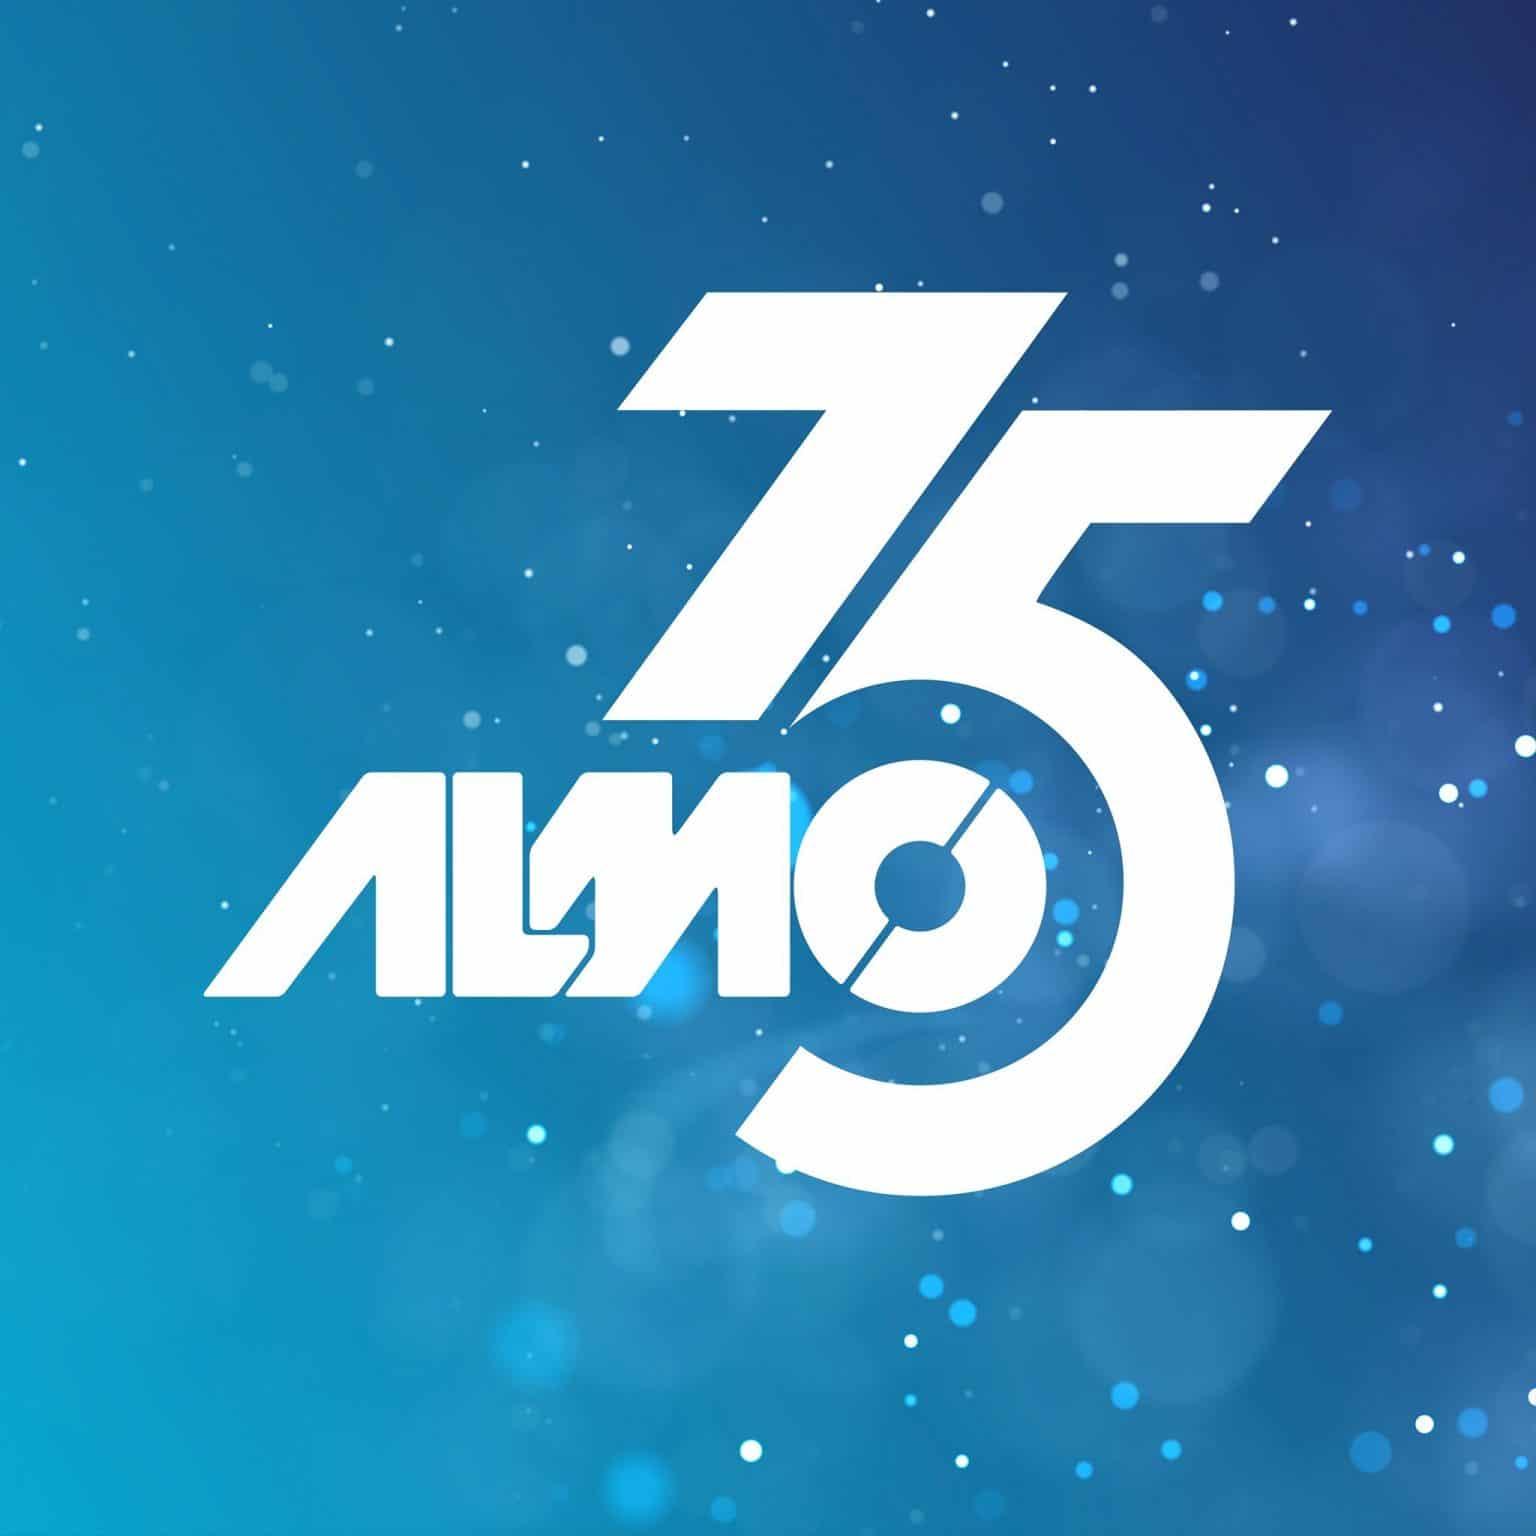 Almo 75 logo in color